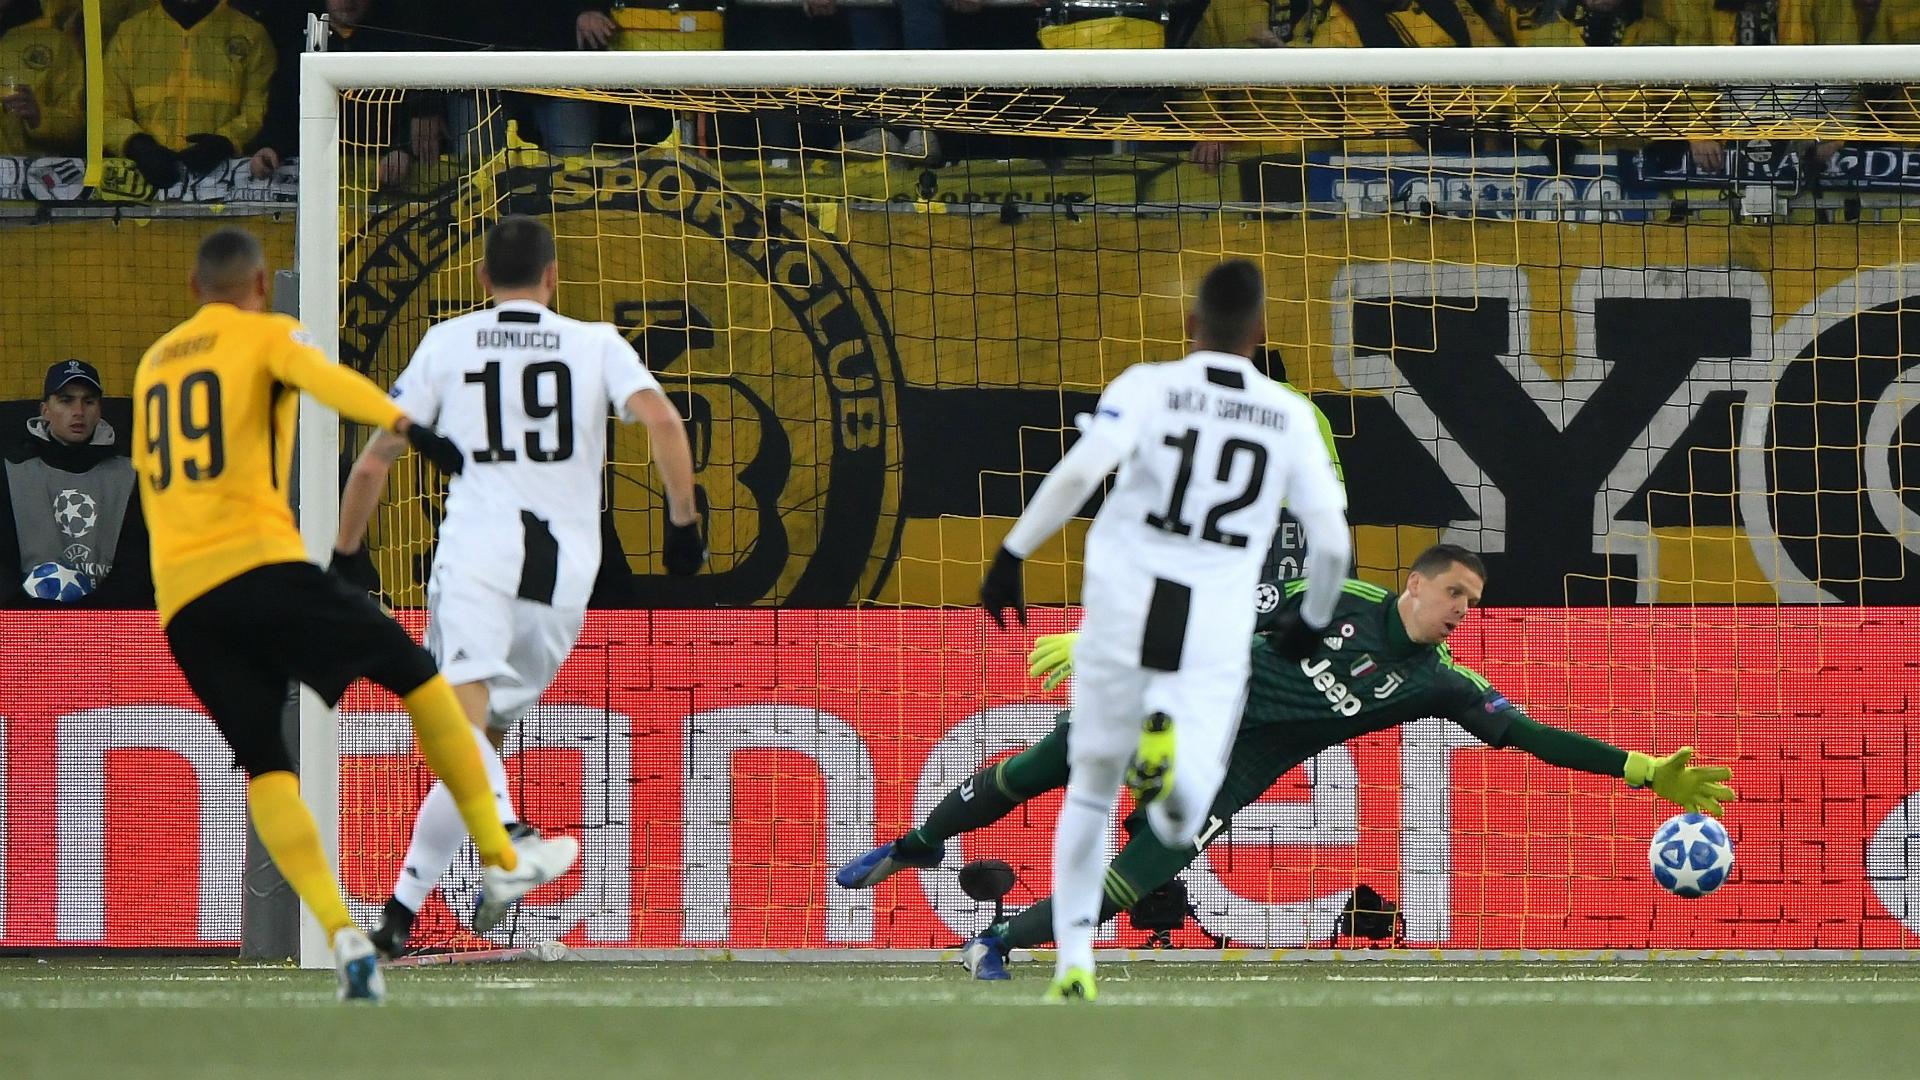 Guillherme Hoarau Alex Sandro Young Boys Juventus Champions League